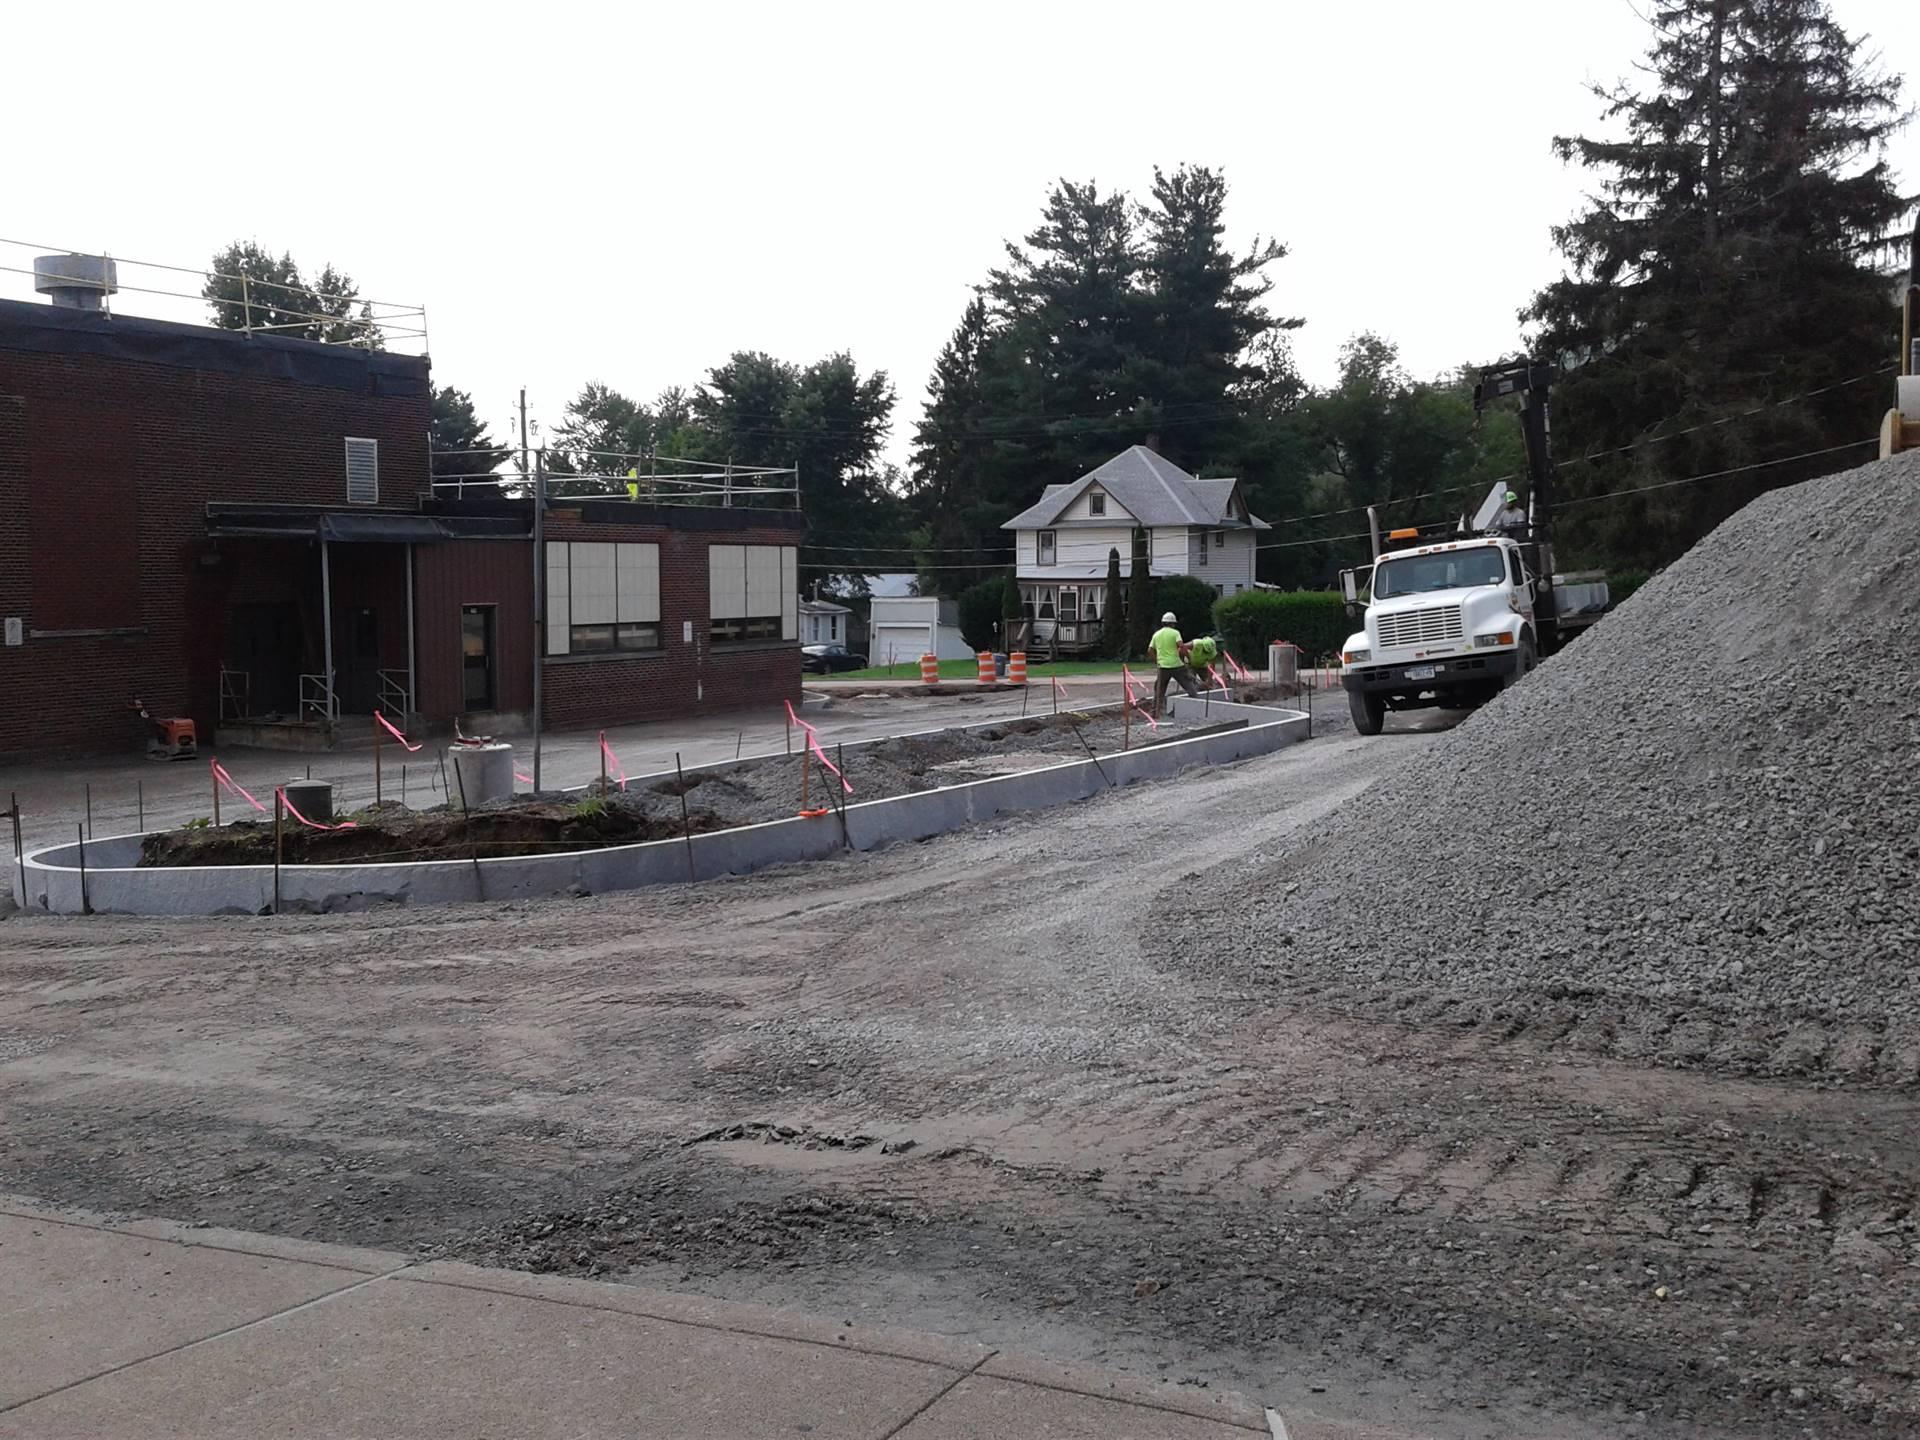 Aug 17 - MPR Parking Lot